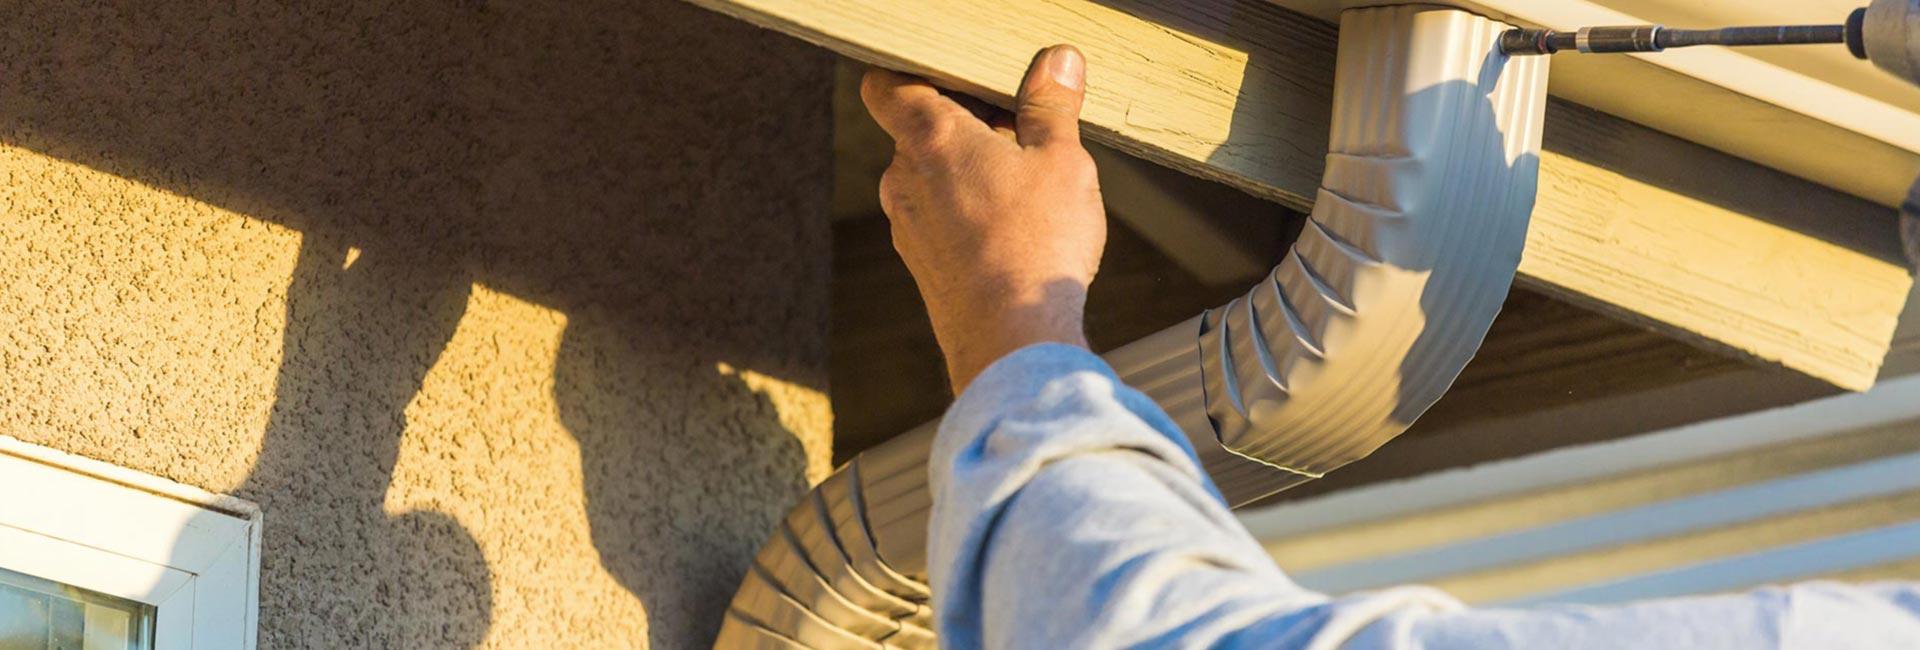 Premier Home Renovations Hamilton Roofing Contractor Hamilton Roofing Contractor Nj Hamilton Roofing Contractor New Jersey Hamilton 08610